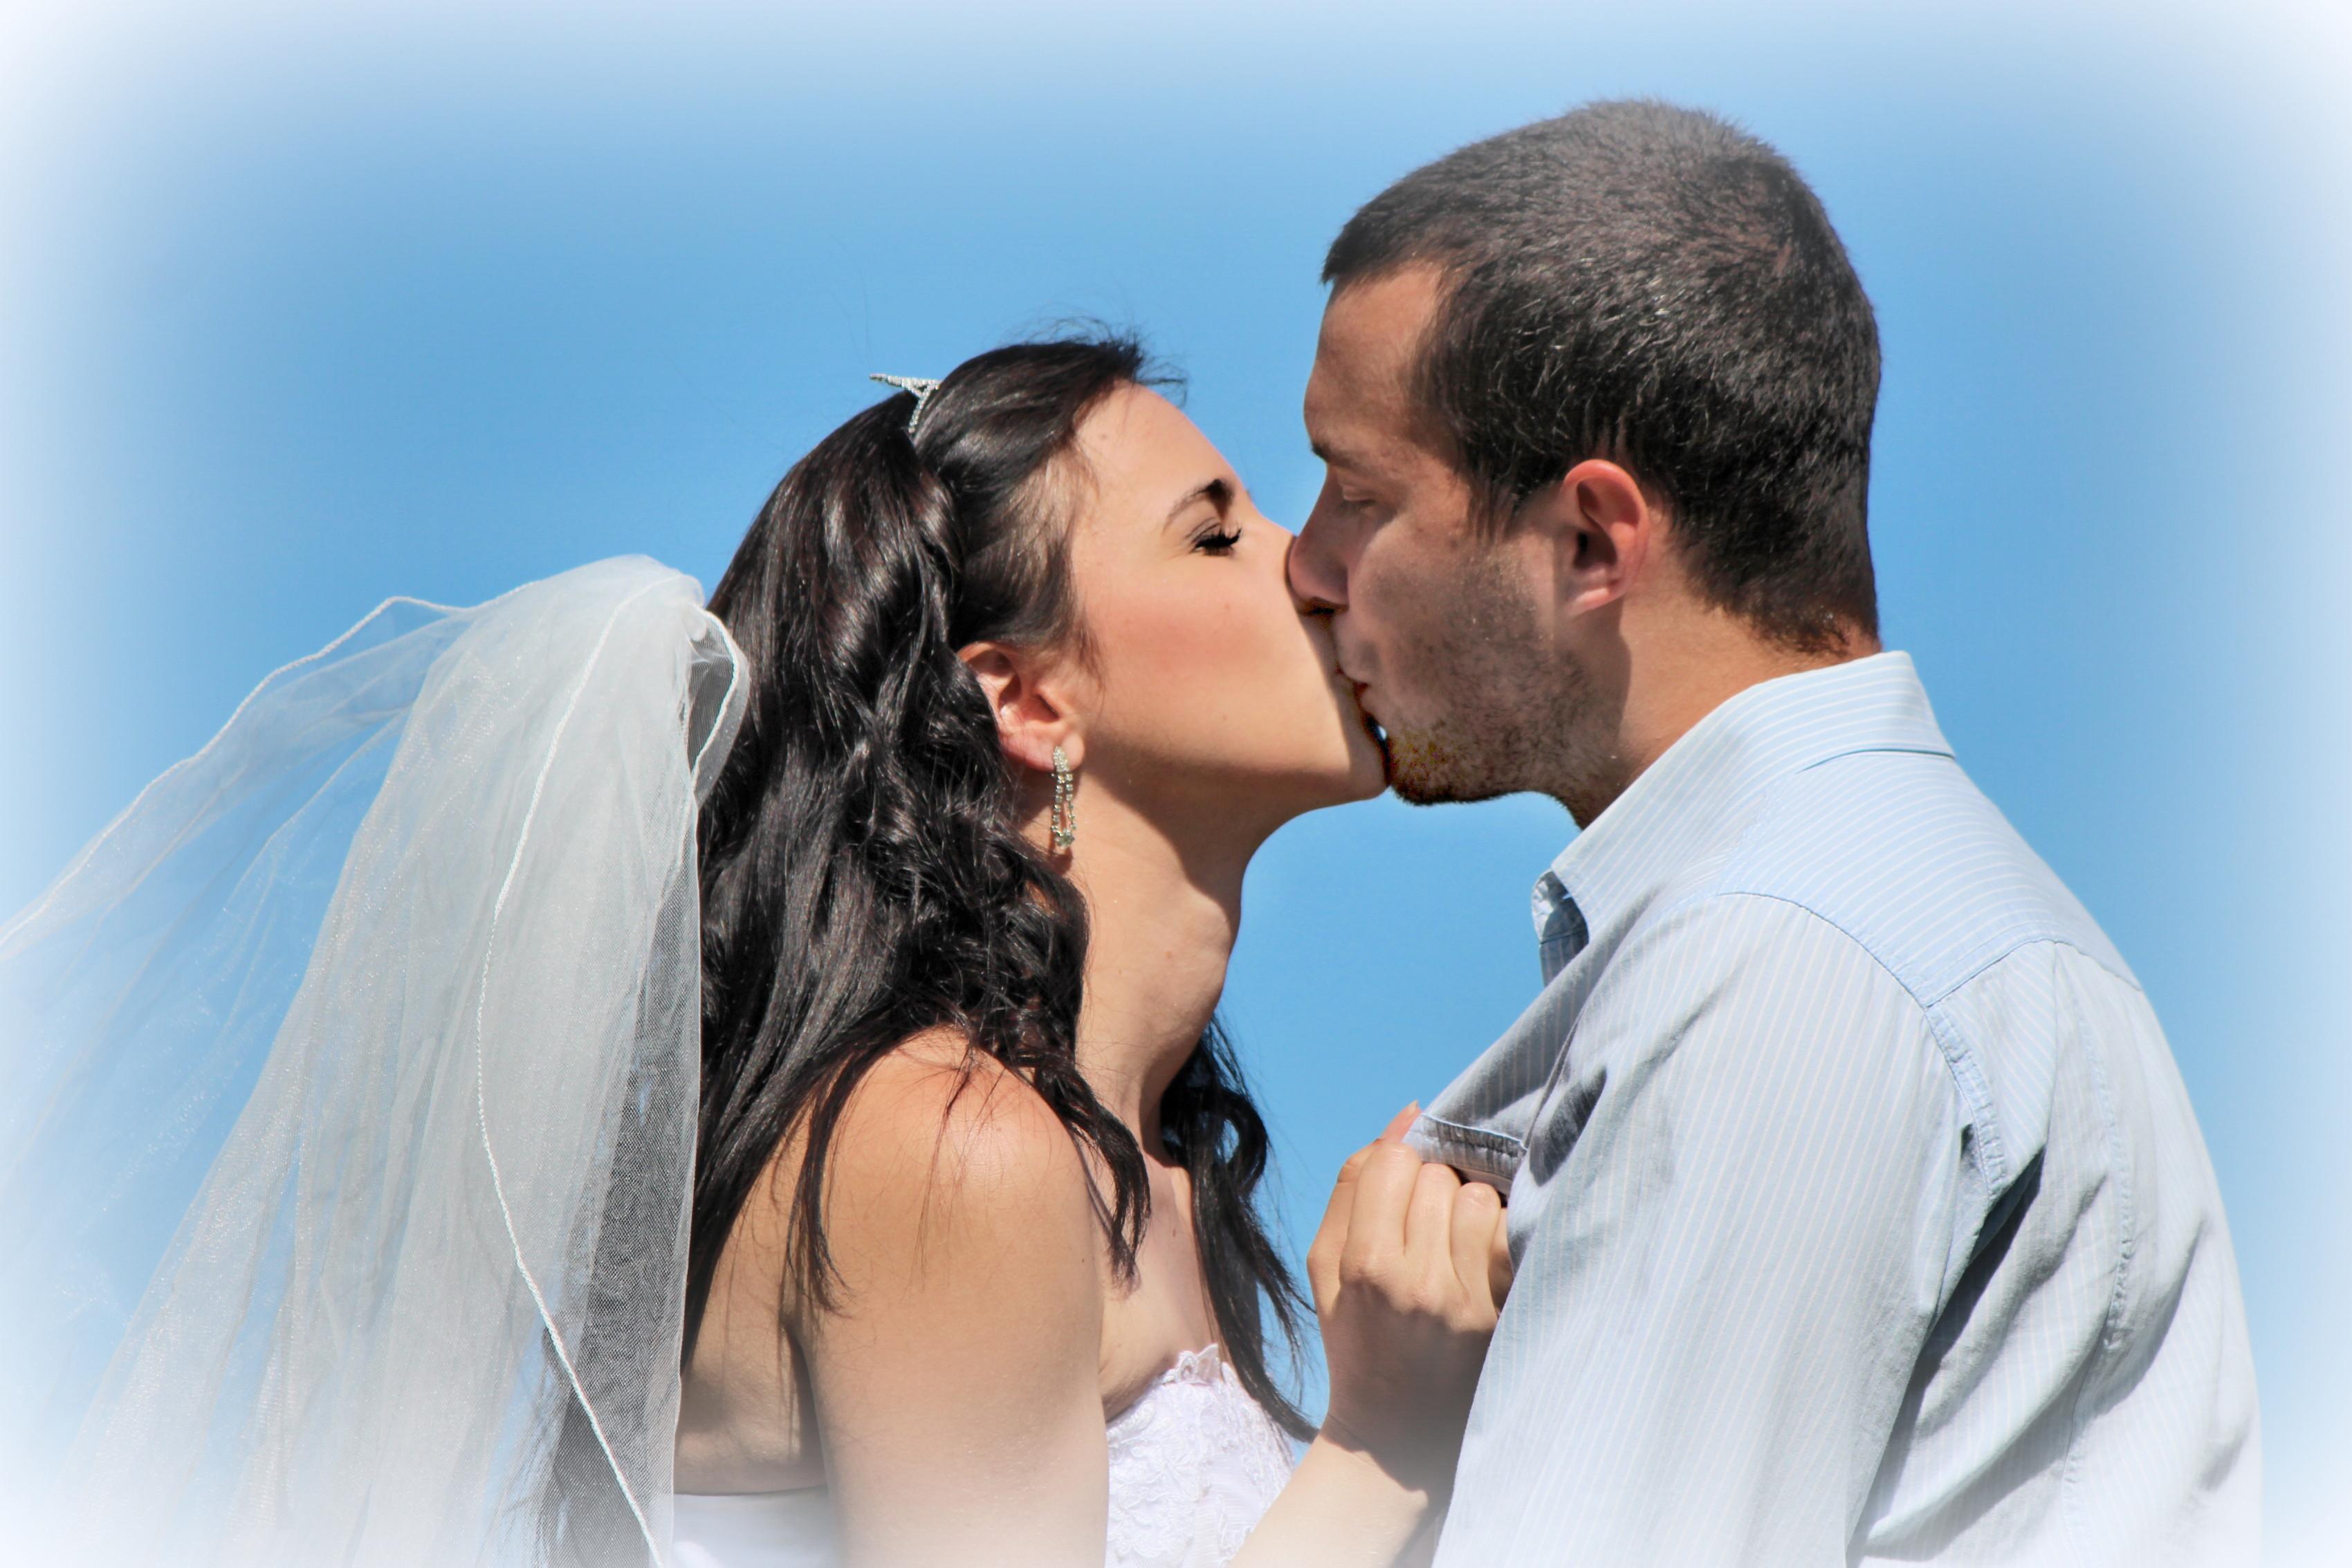 Wedding Half Day (7-8hours)